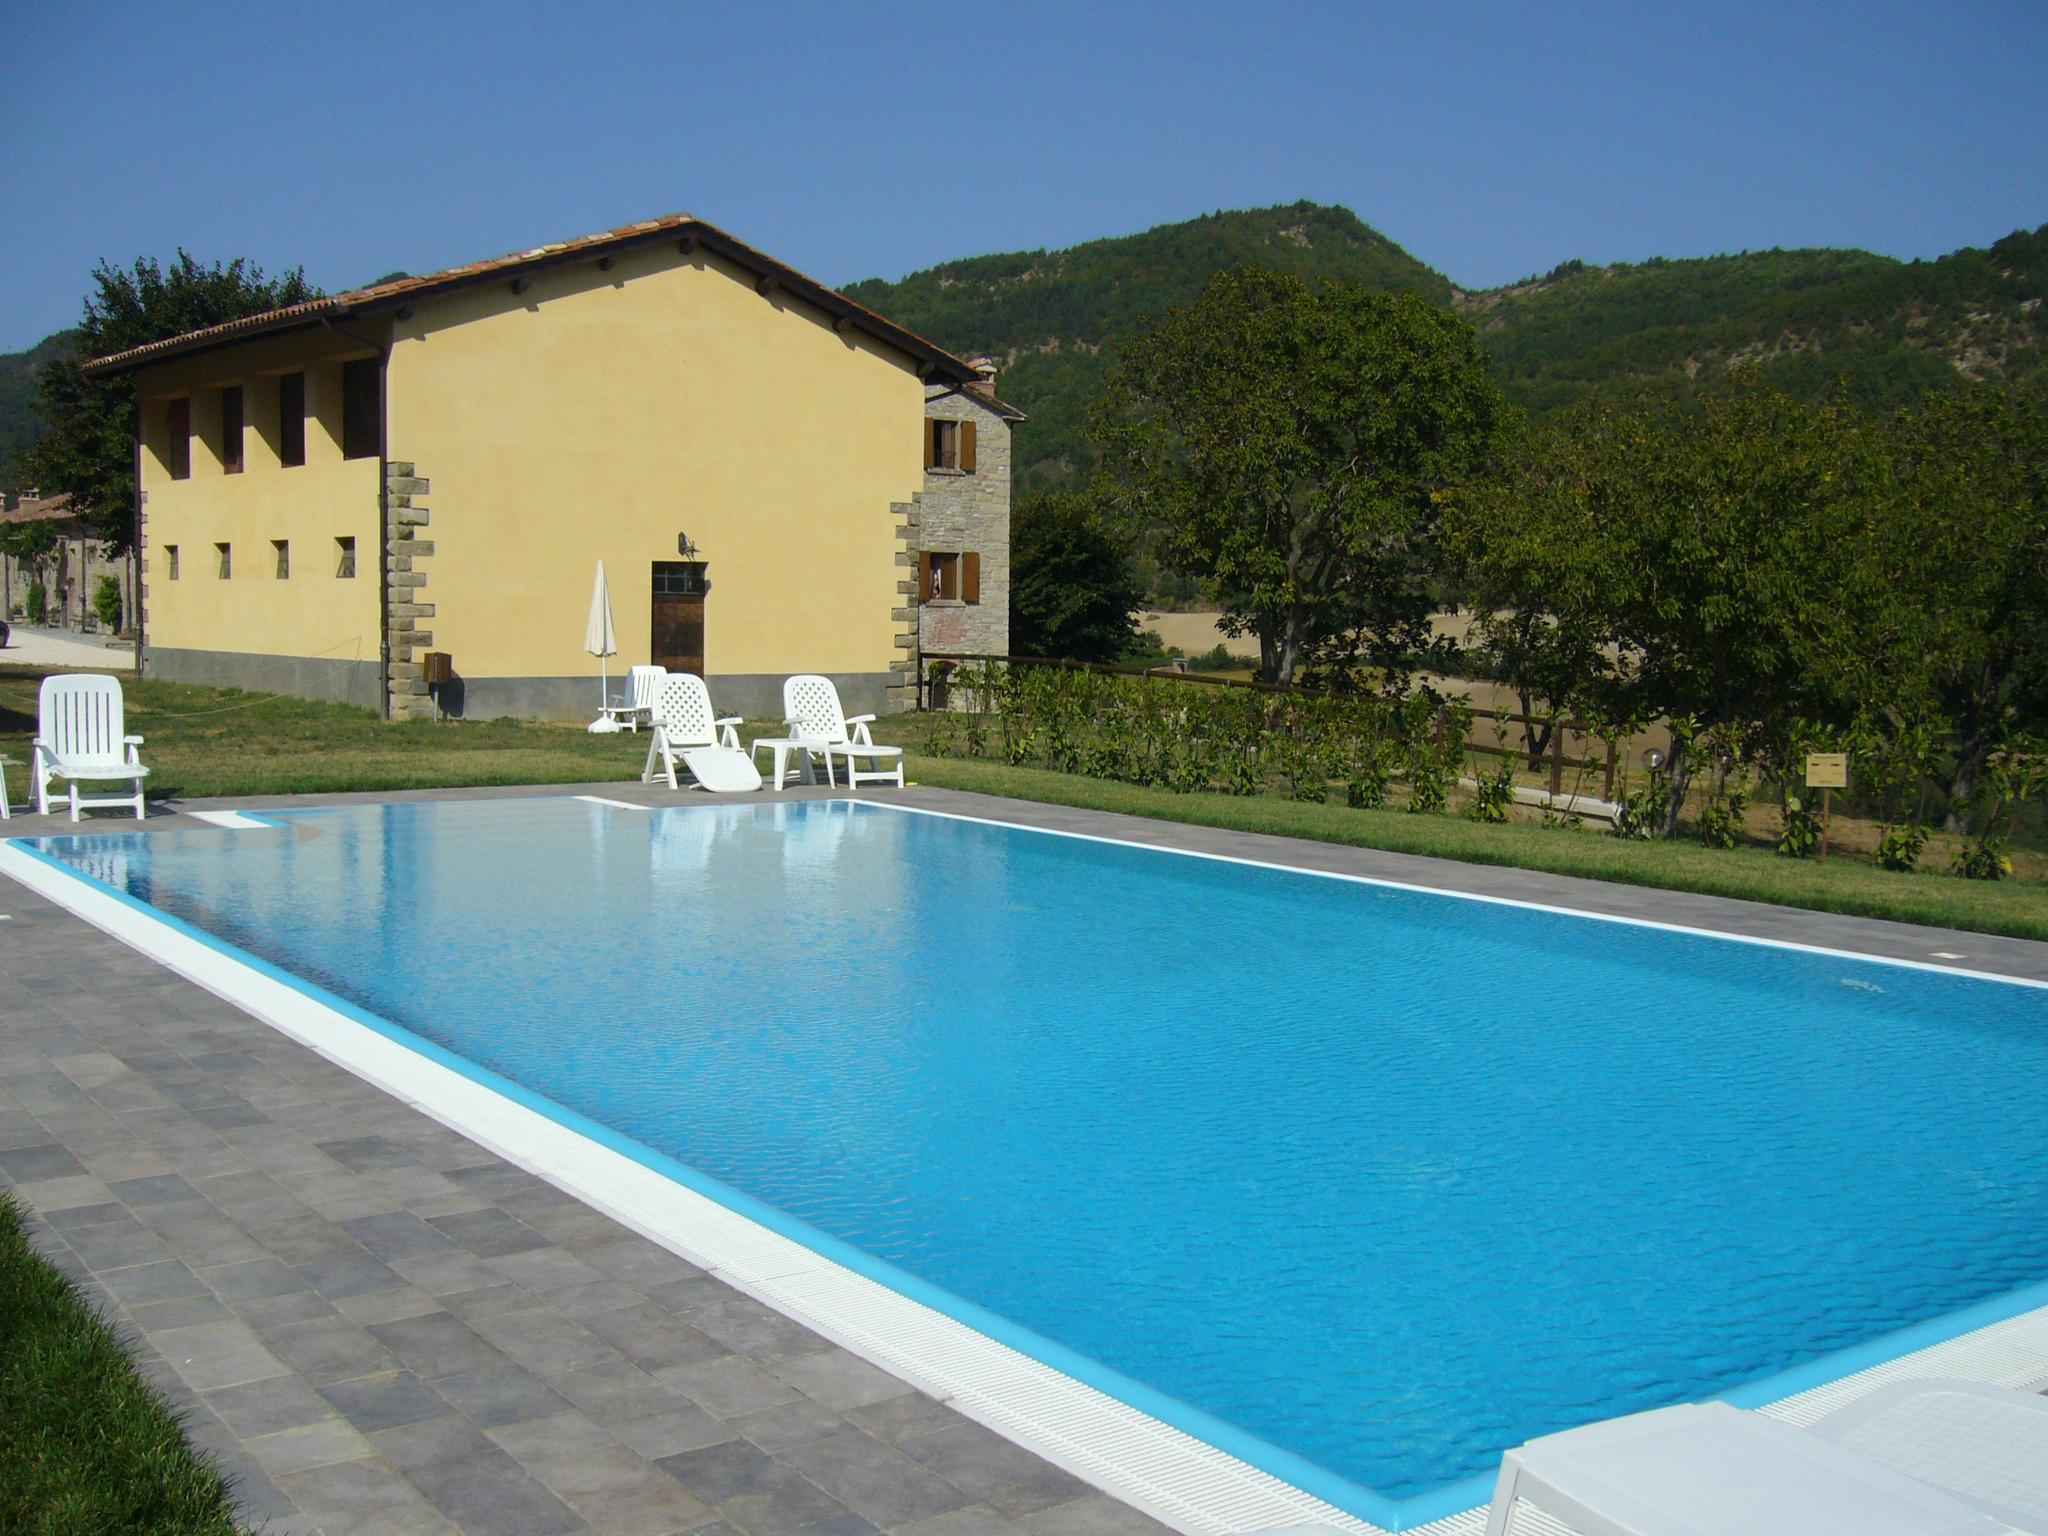 Agriturismo piscina toscana for Piscina firenze